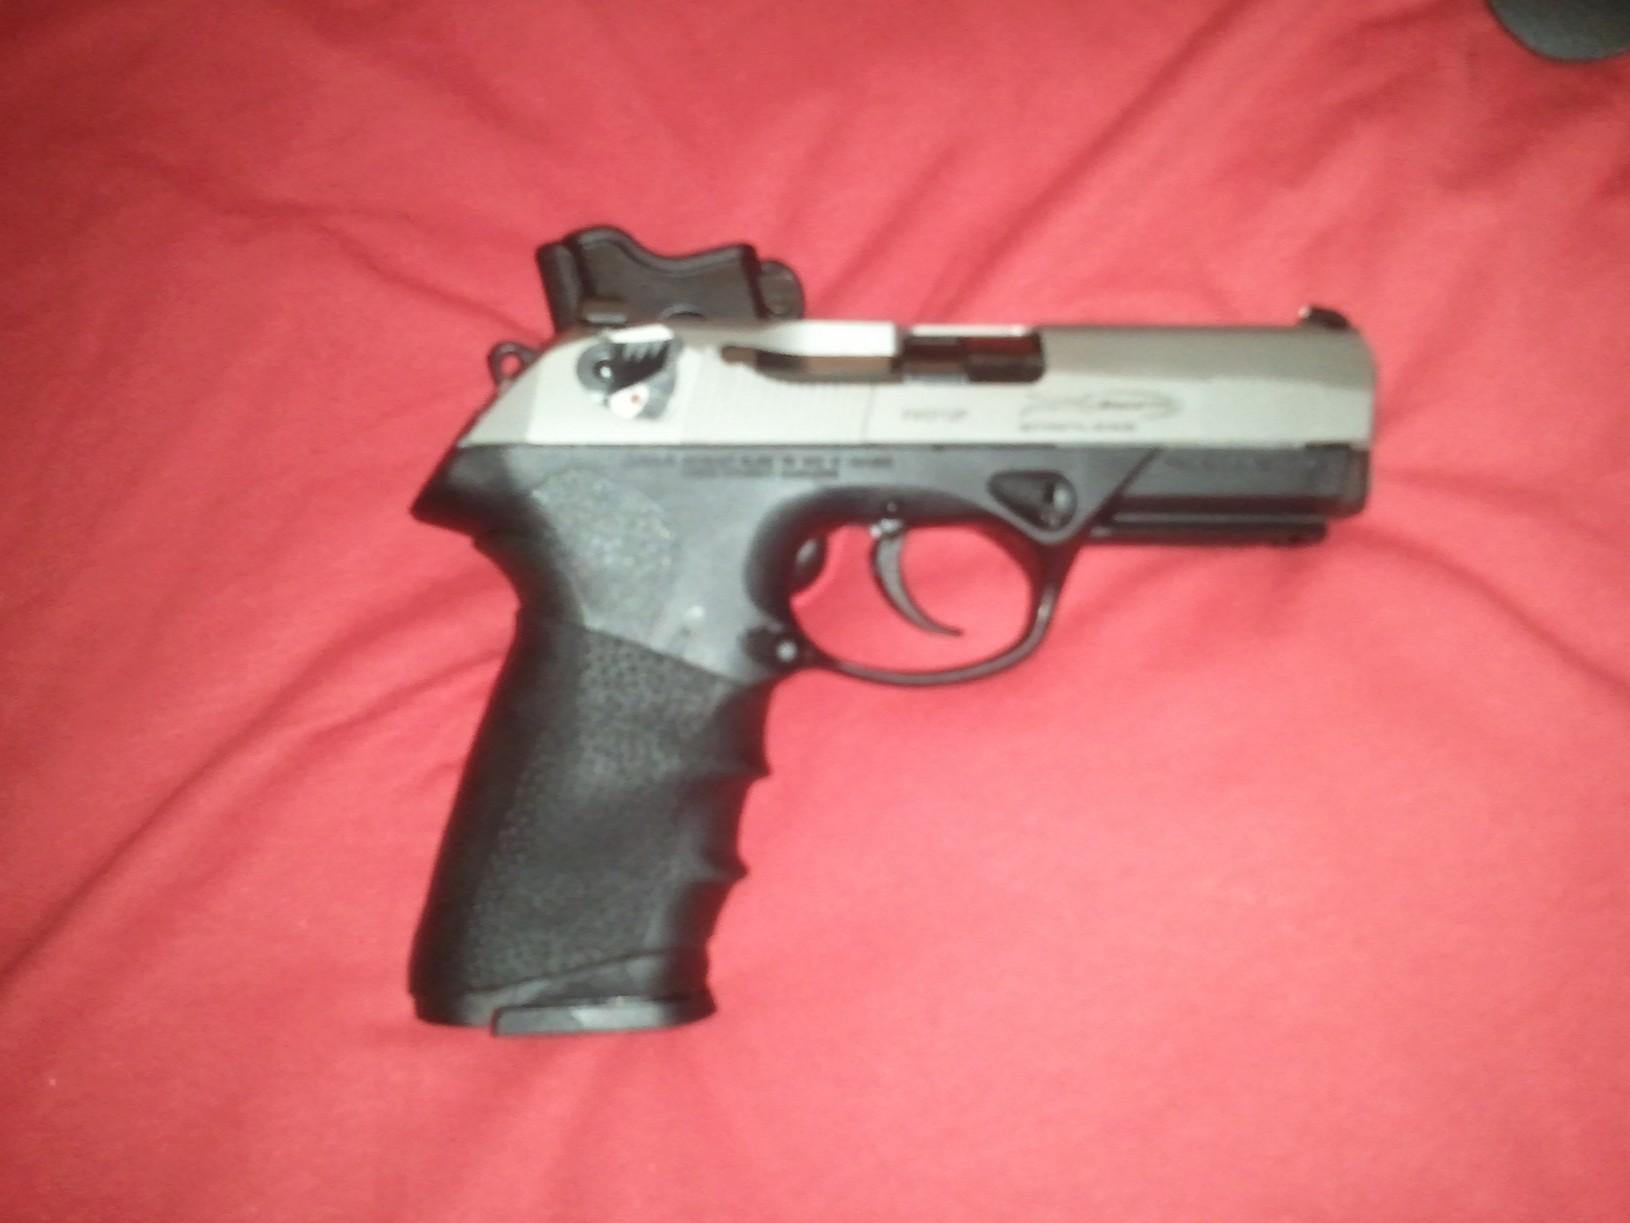 PX 4 Storm .45 Beretta--Where's the Love?-wp_000142.jpg